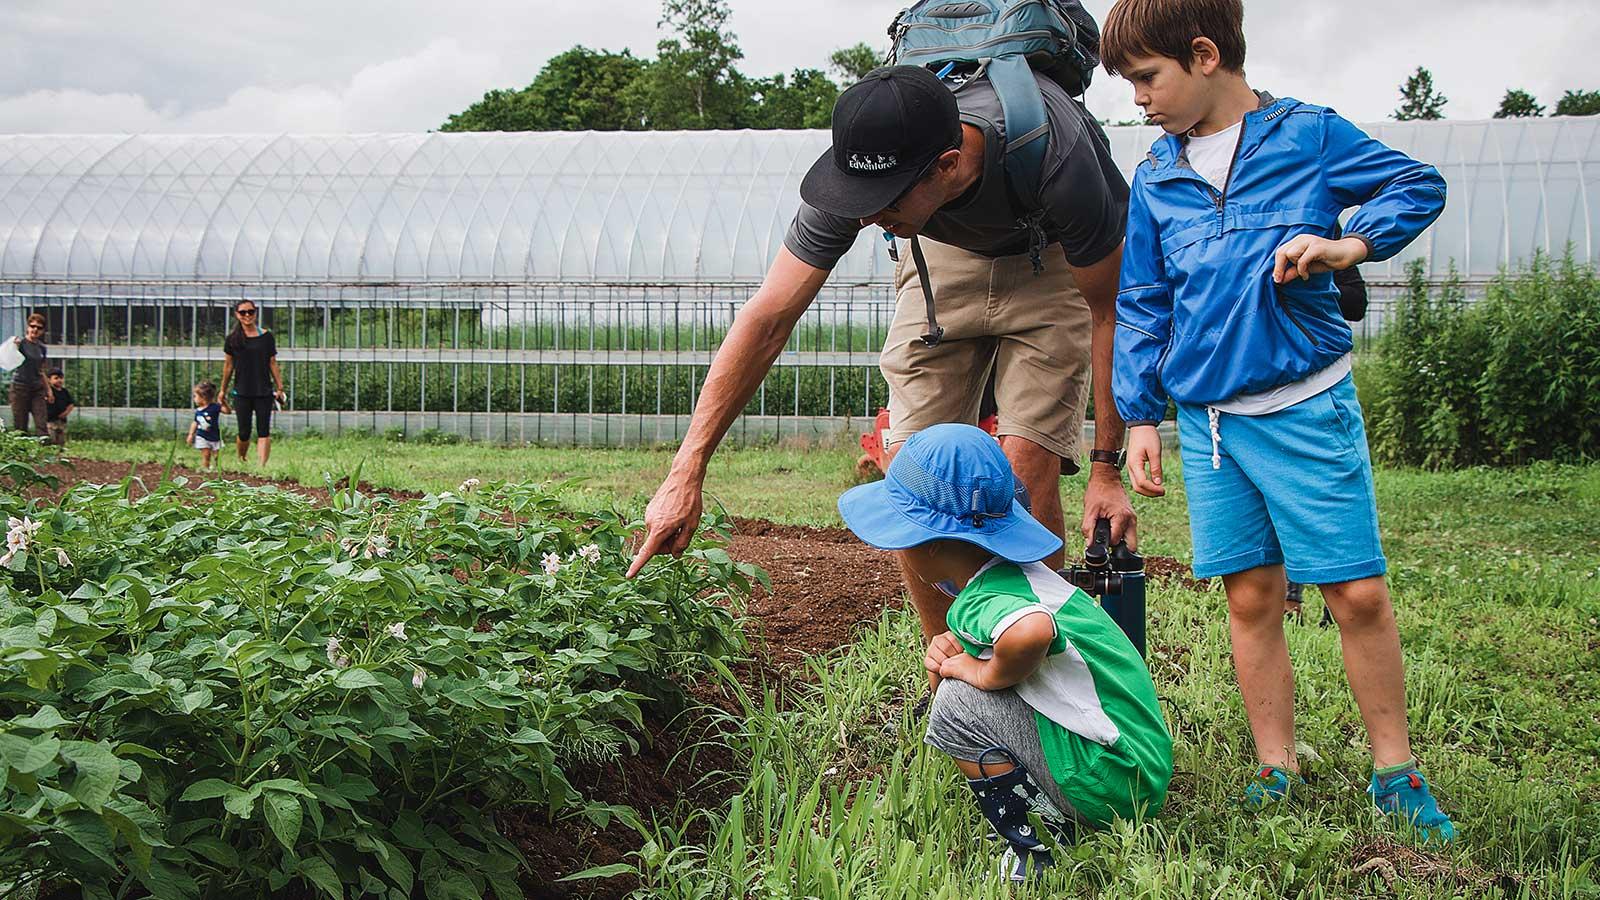 Camp leader and children picking vegetables at farm